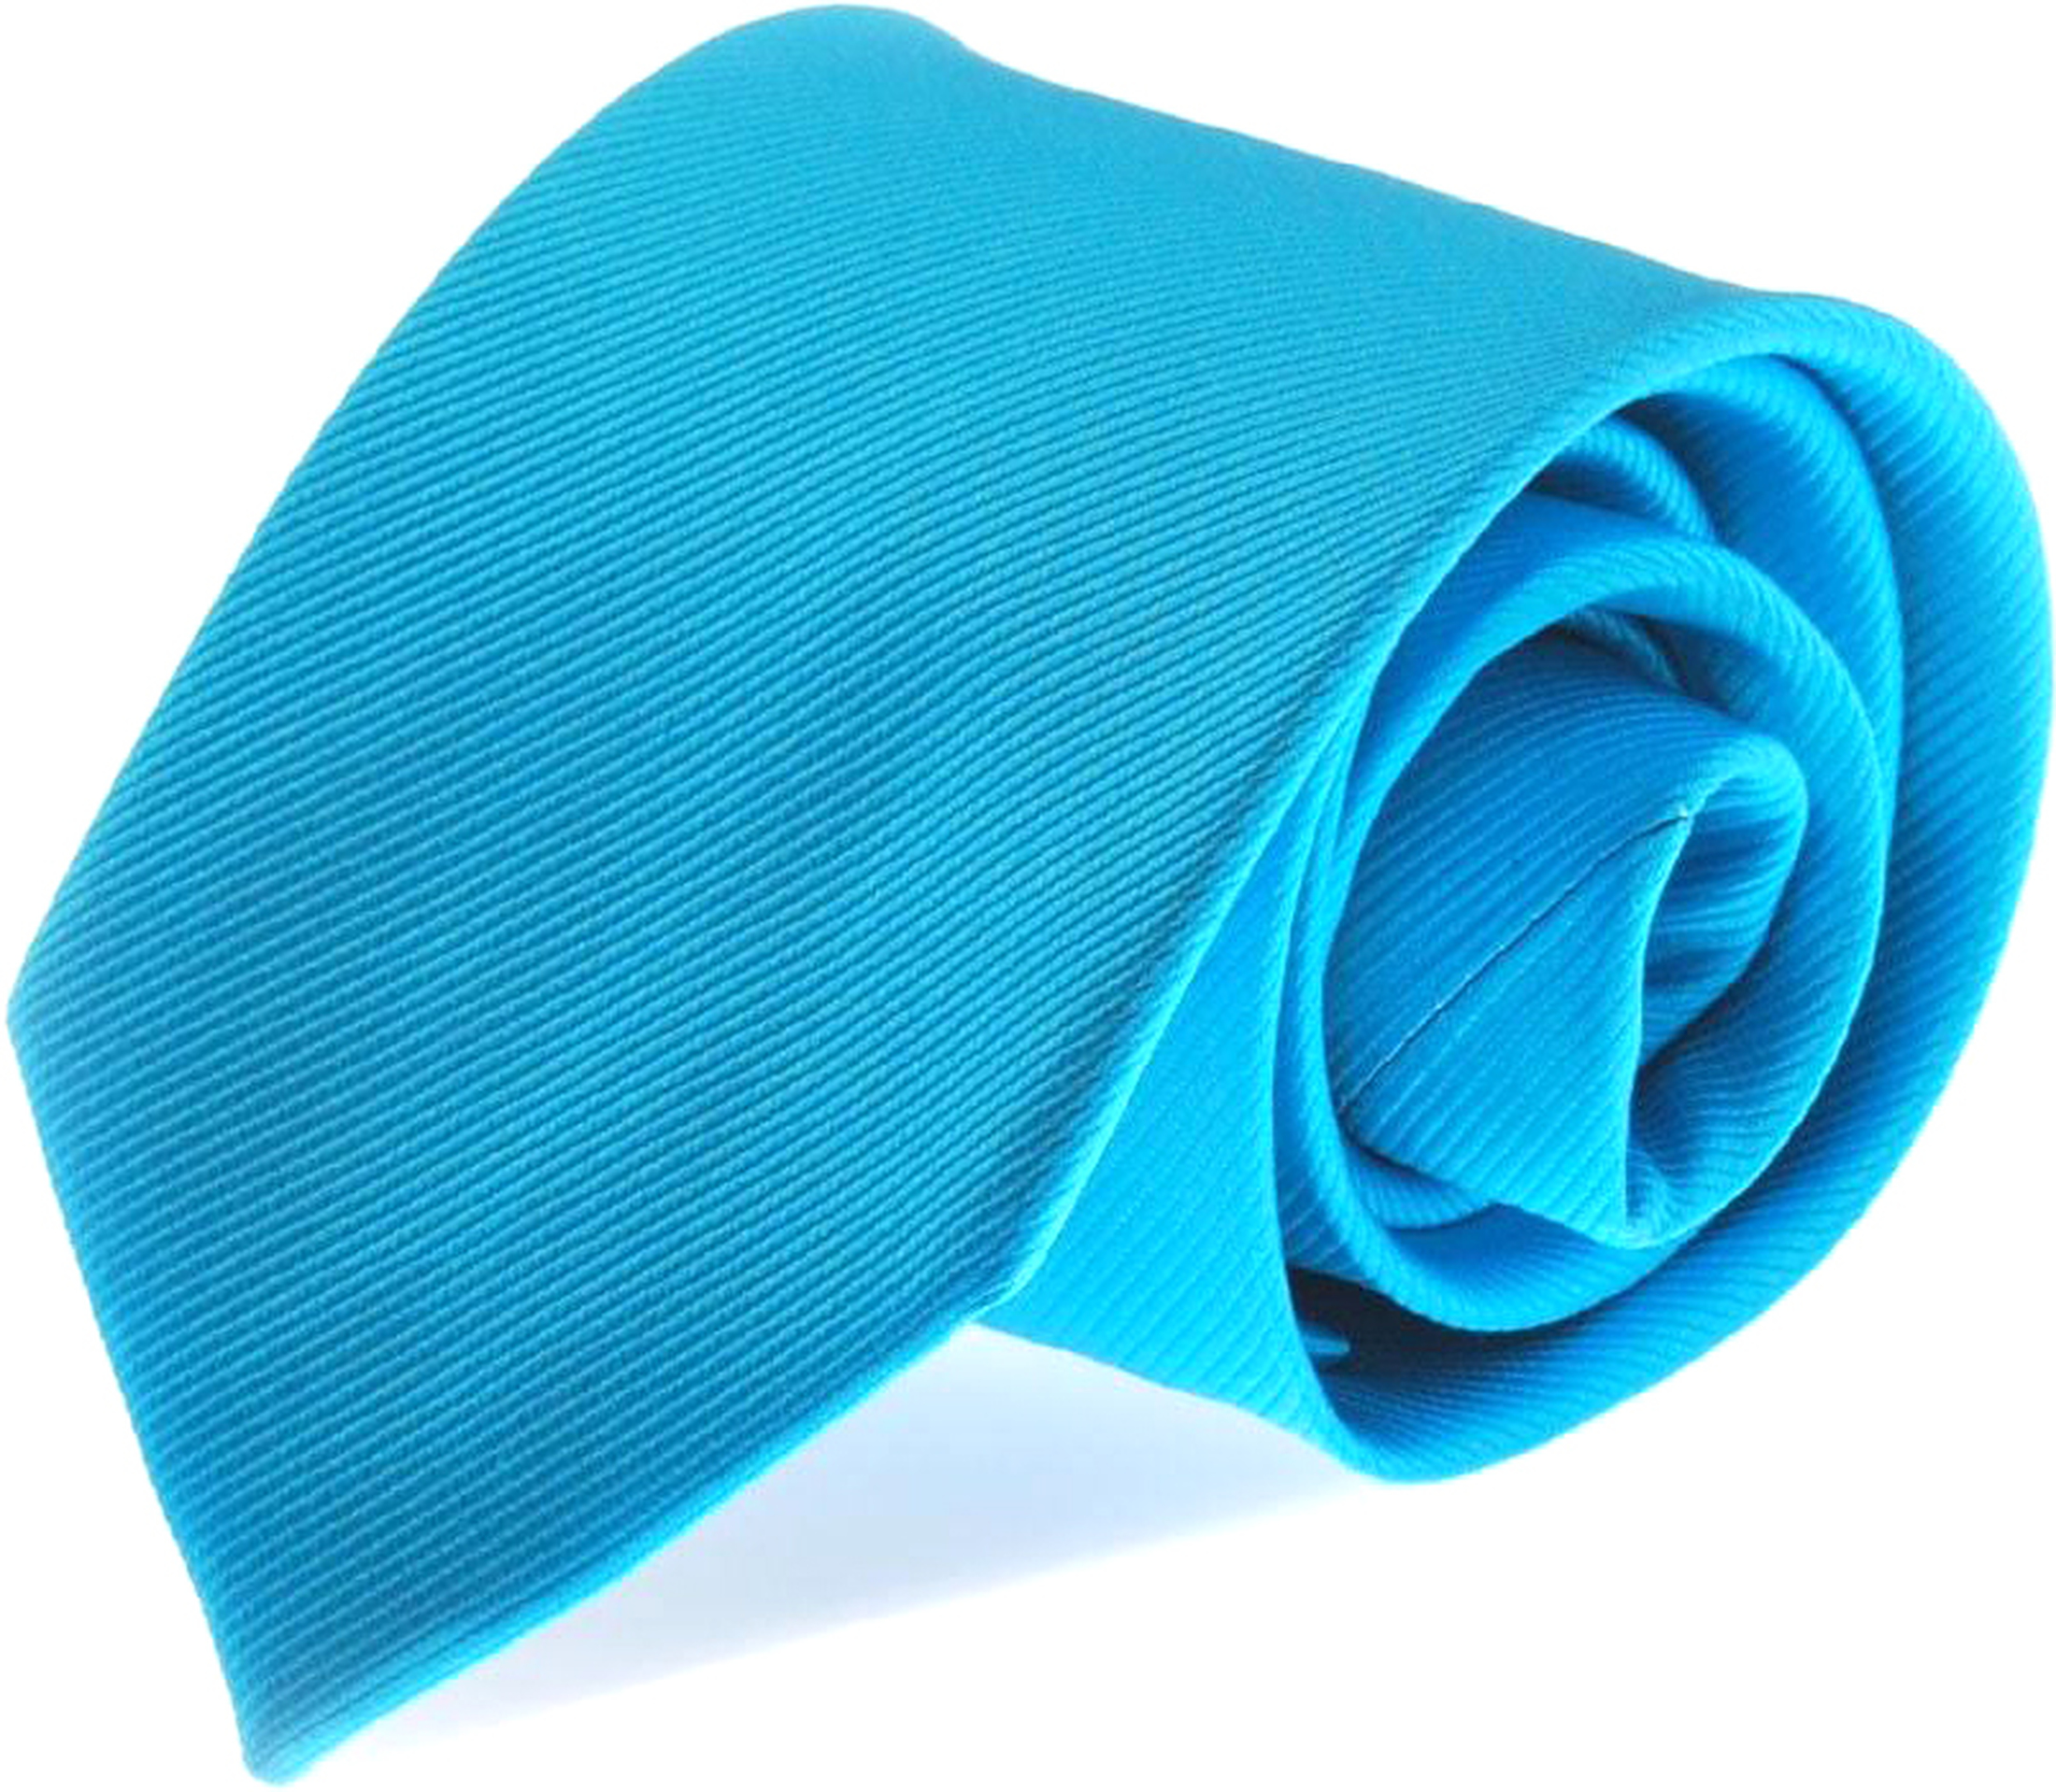 Krawatte Seide Aqua Blau Uni F24 foto 0